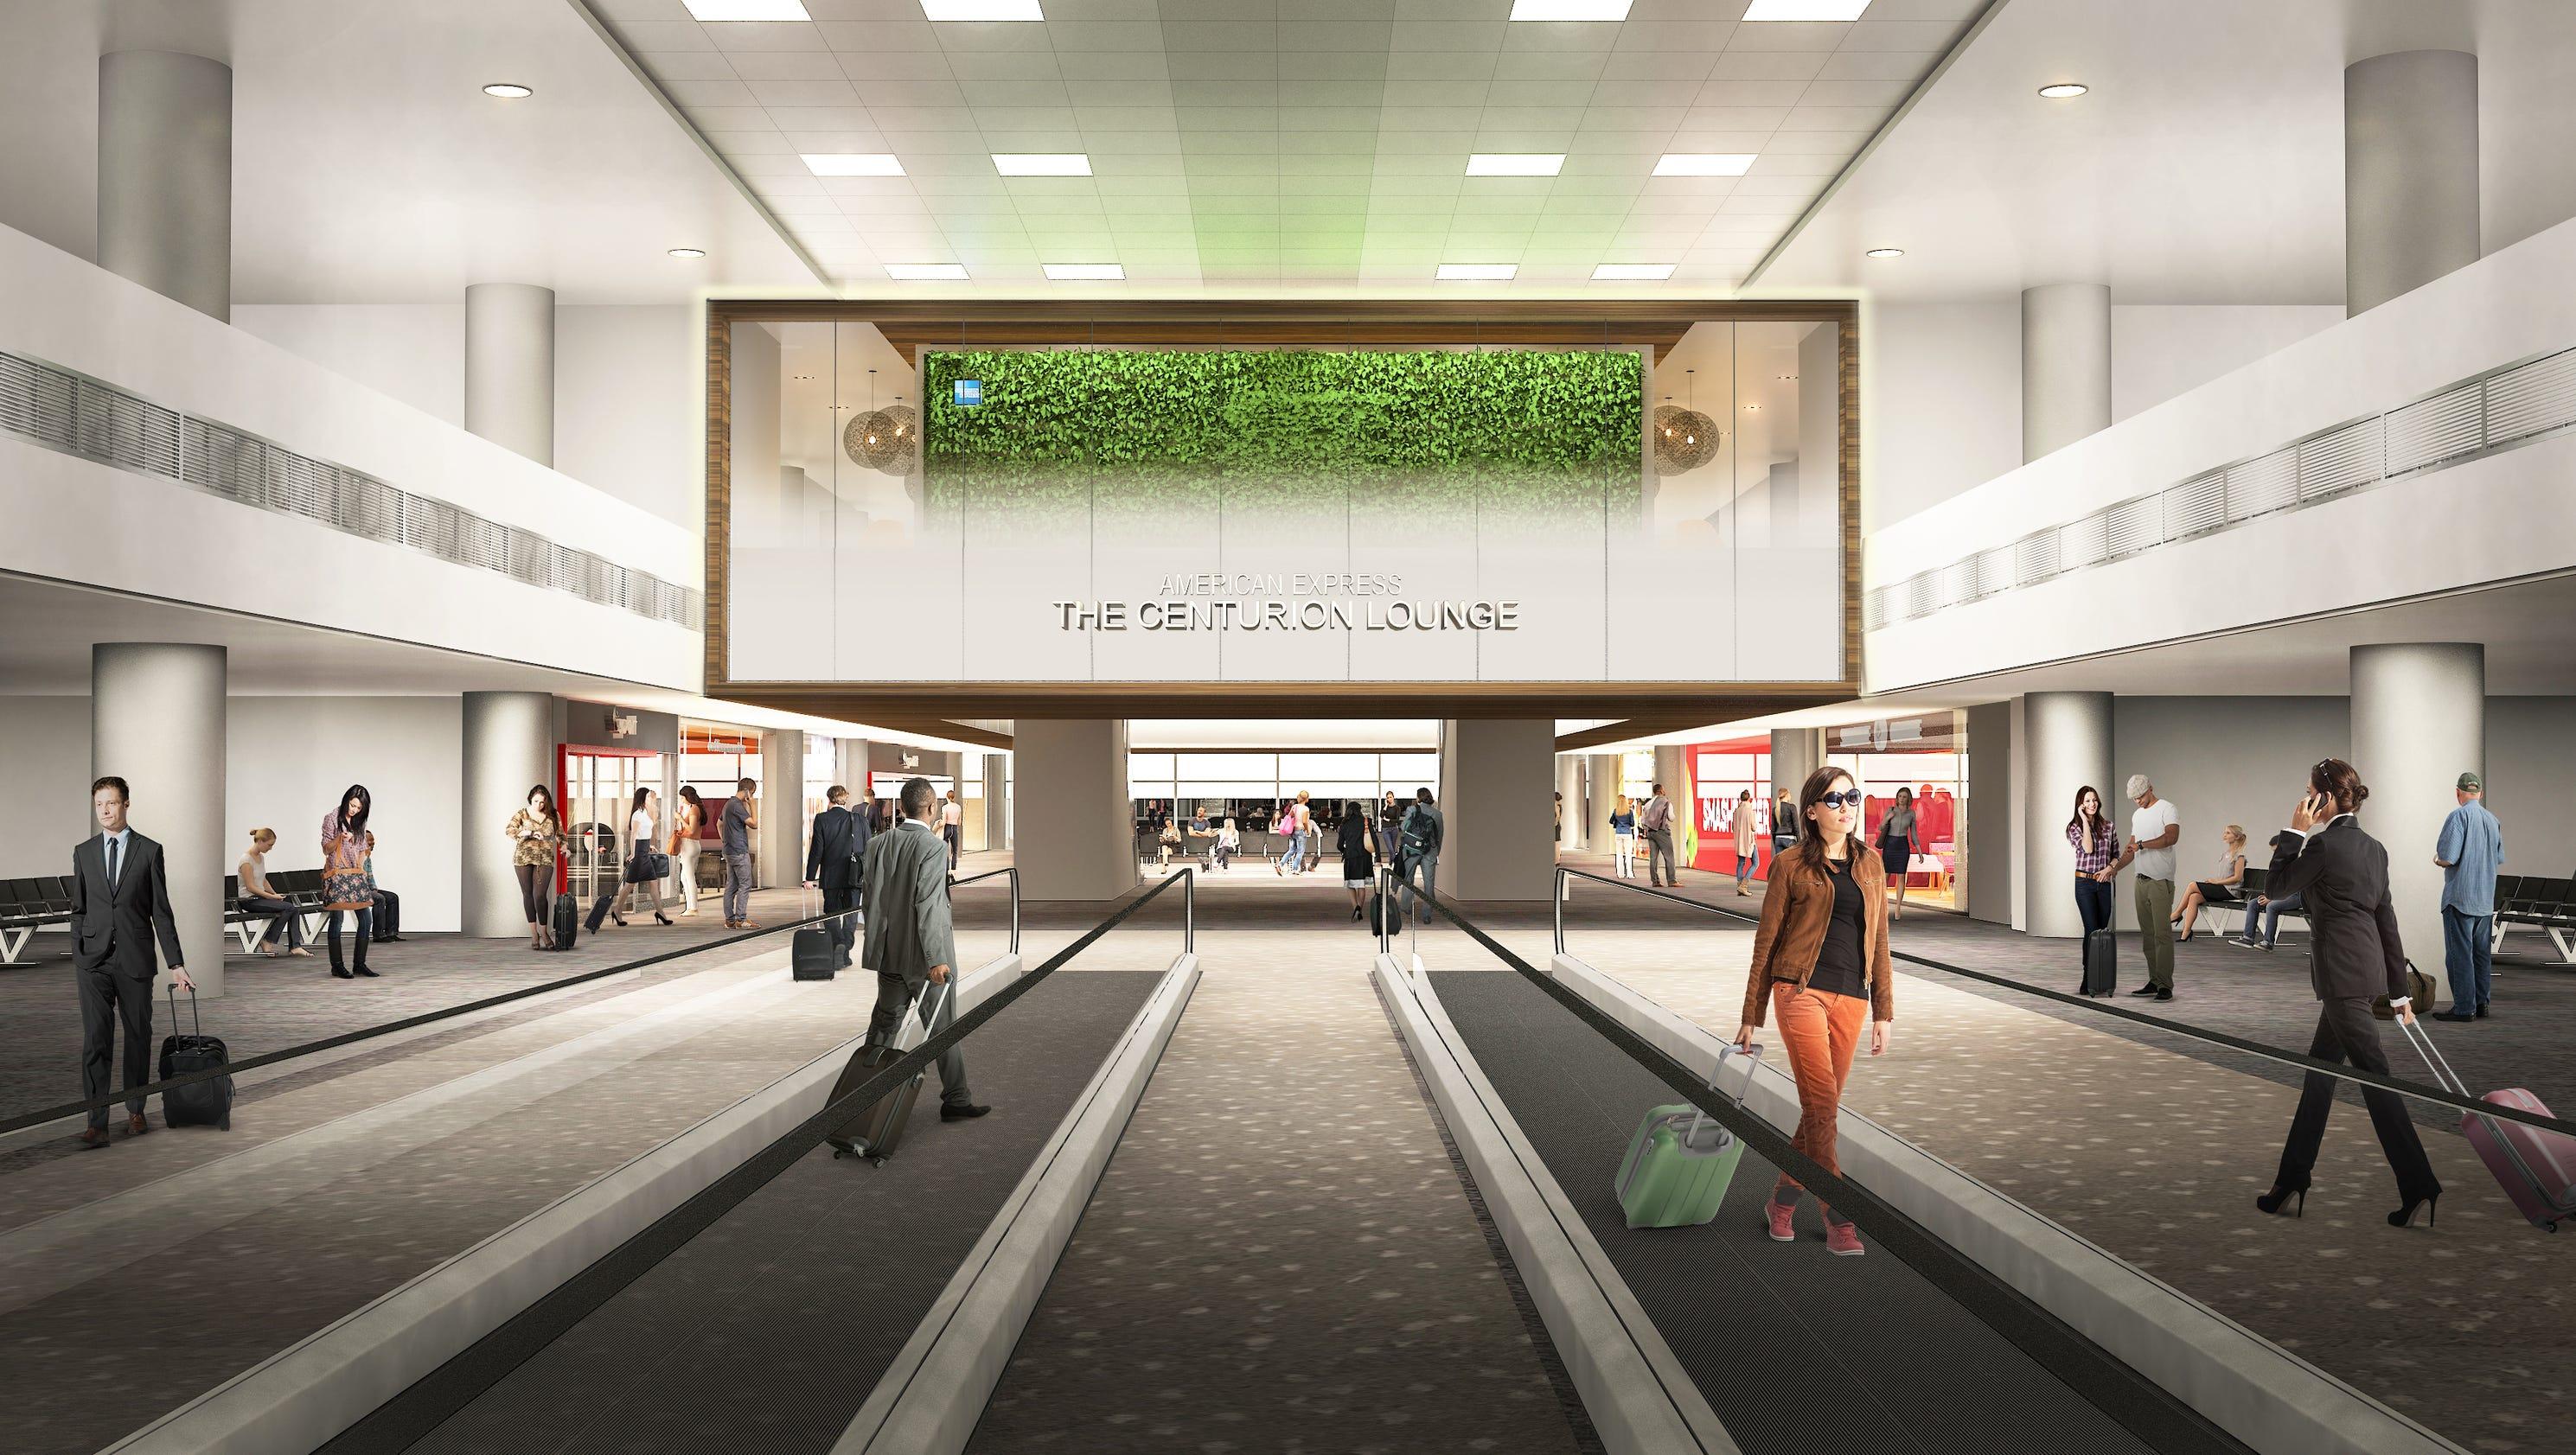 Amex Centurion Lounge Denver Airport Next To Get Posh Club